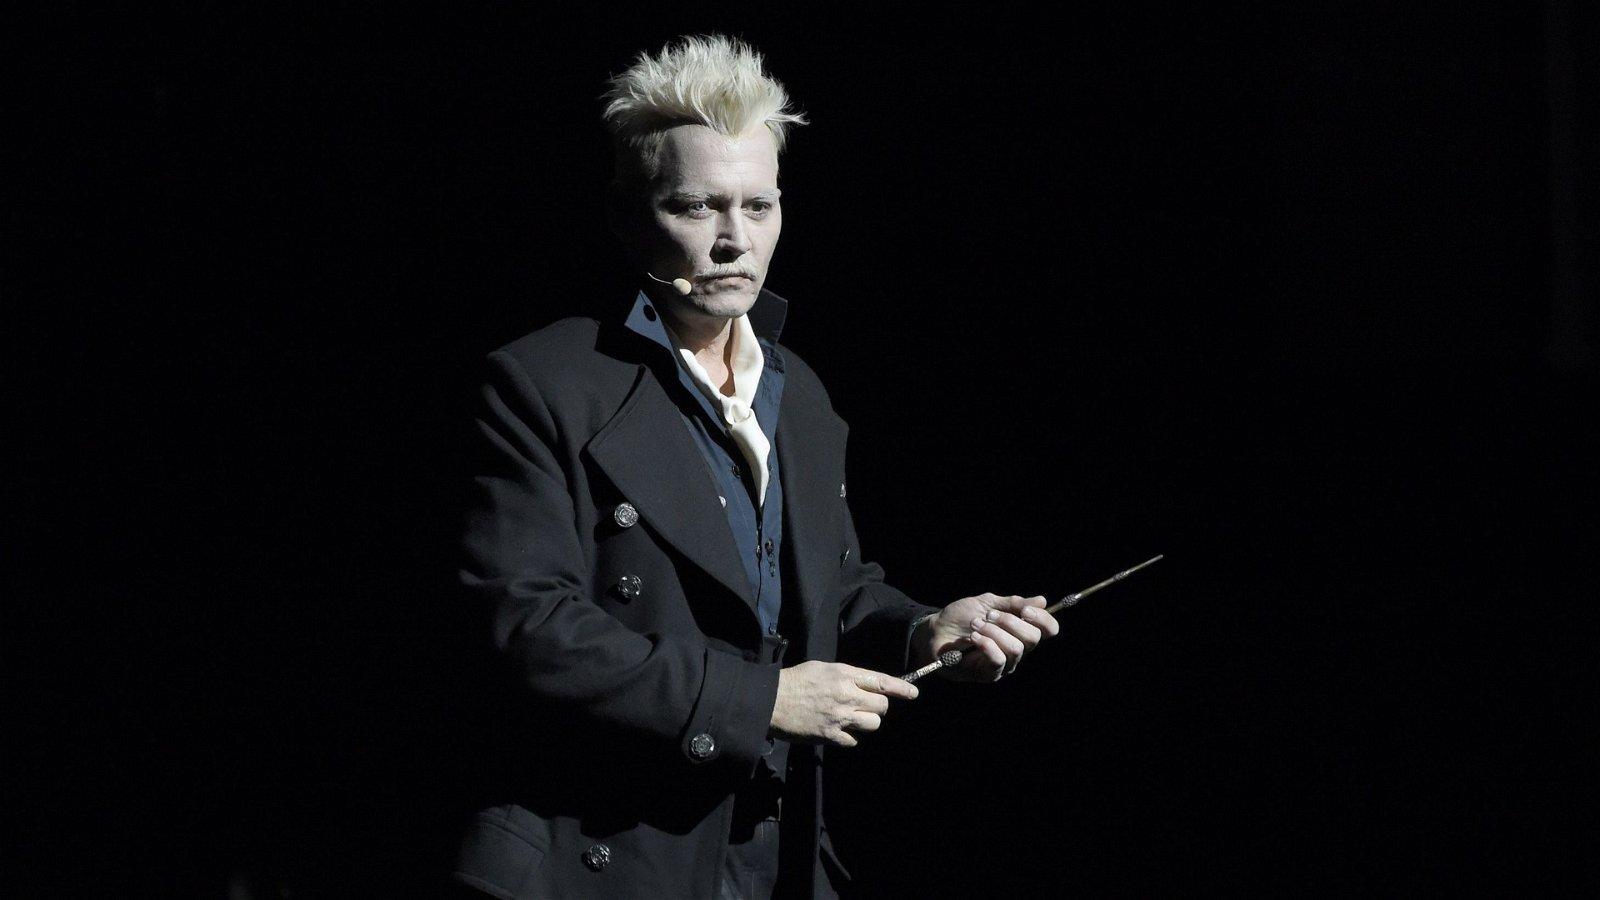 Johnny Depp Resigns as Grindelwald for Fantastic Beasts 3 1